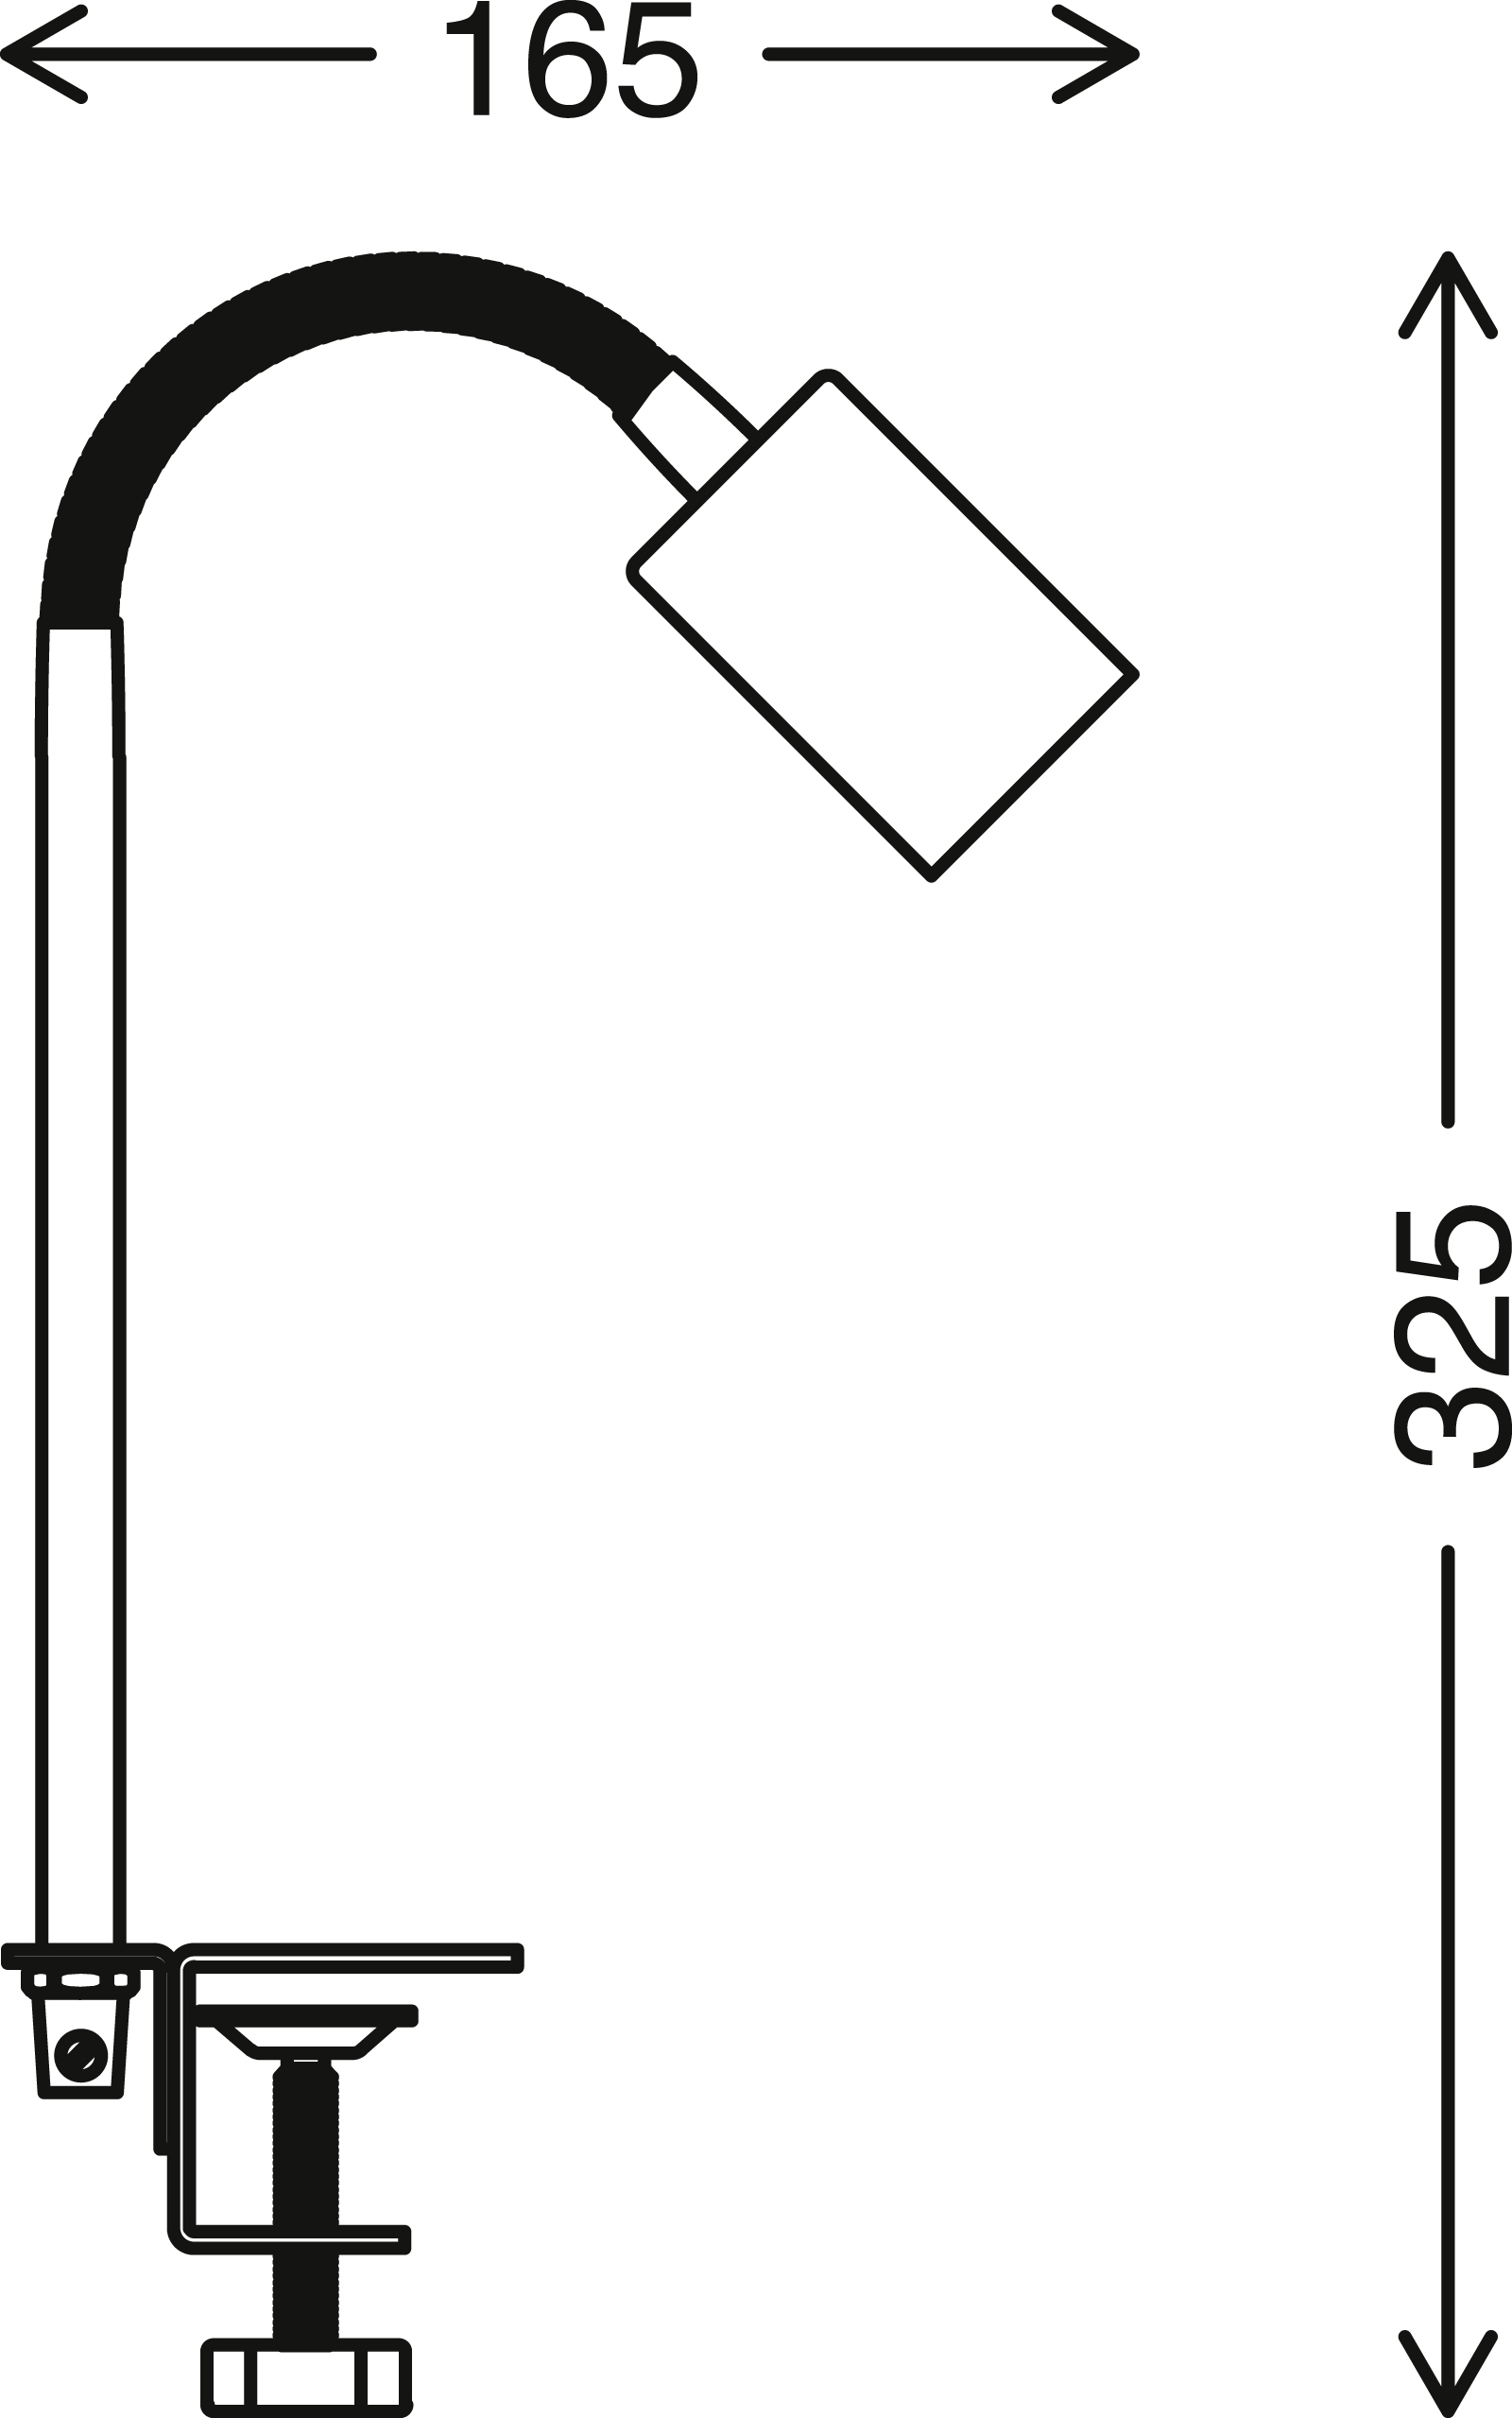 LED Klemmleuchte, 32,5 cm, max. 10 W, Weiss